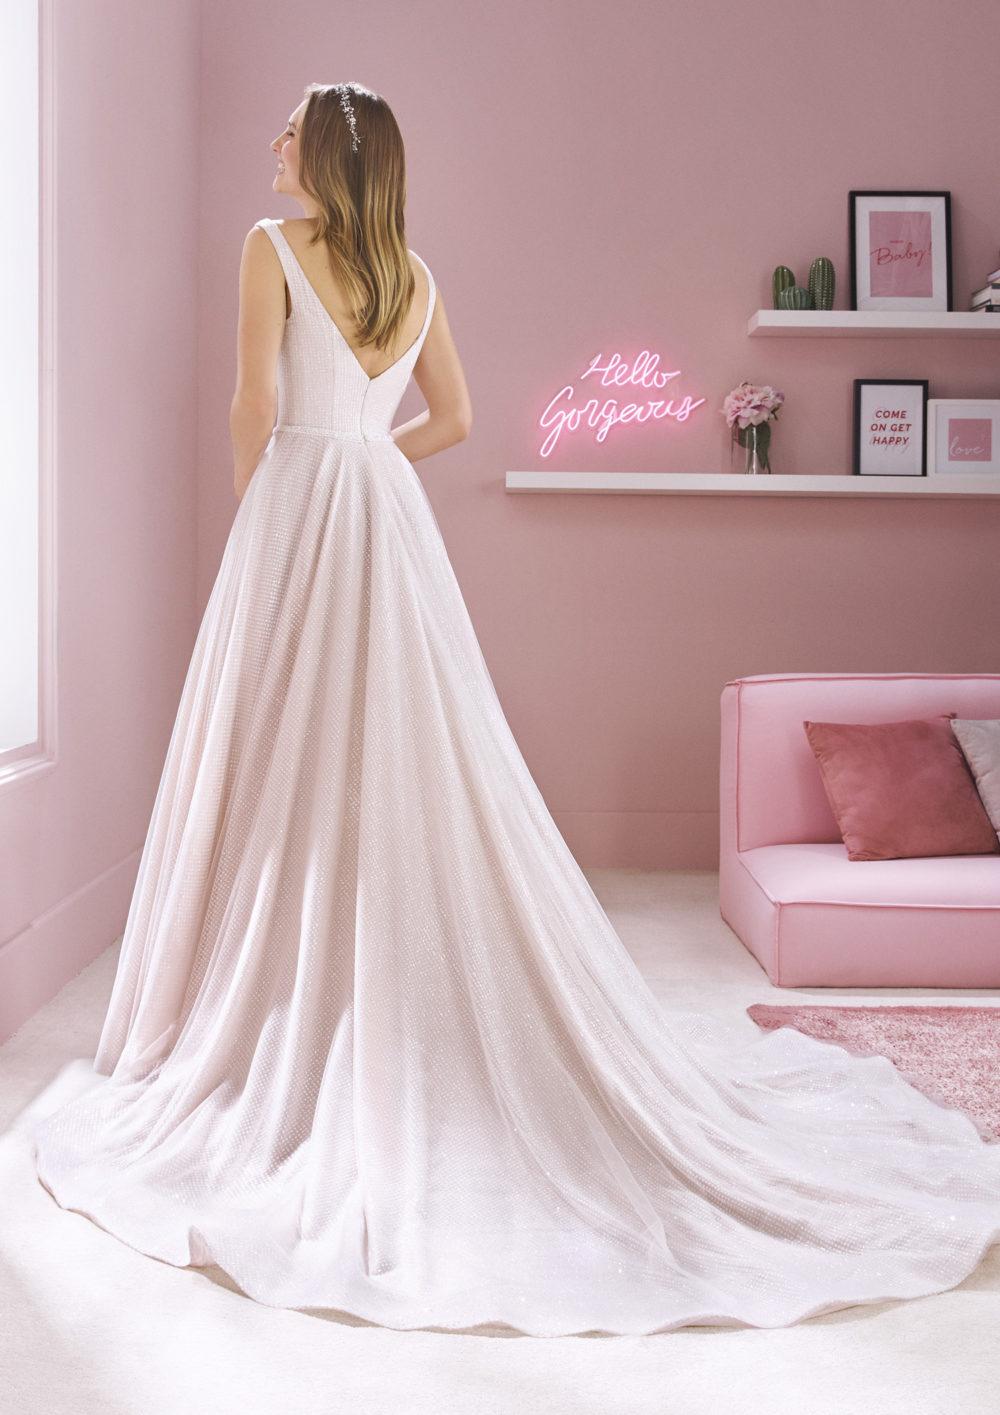 Mariages: abito da sposa Poème 2020 a Vicenza, Verona, Padova, Veneto NINA